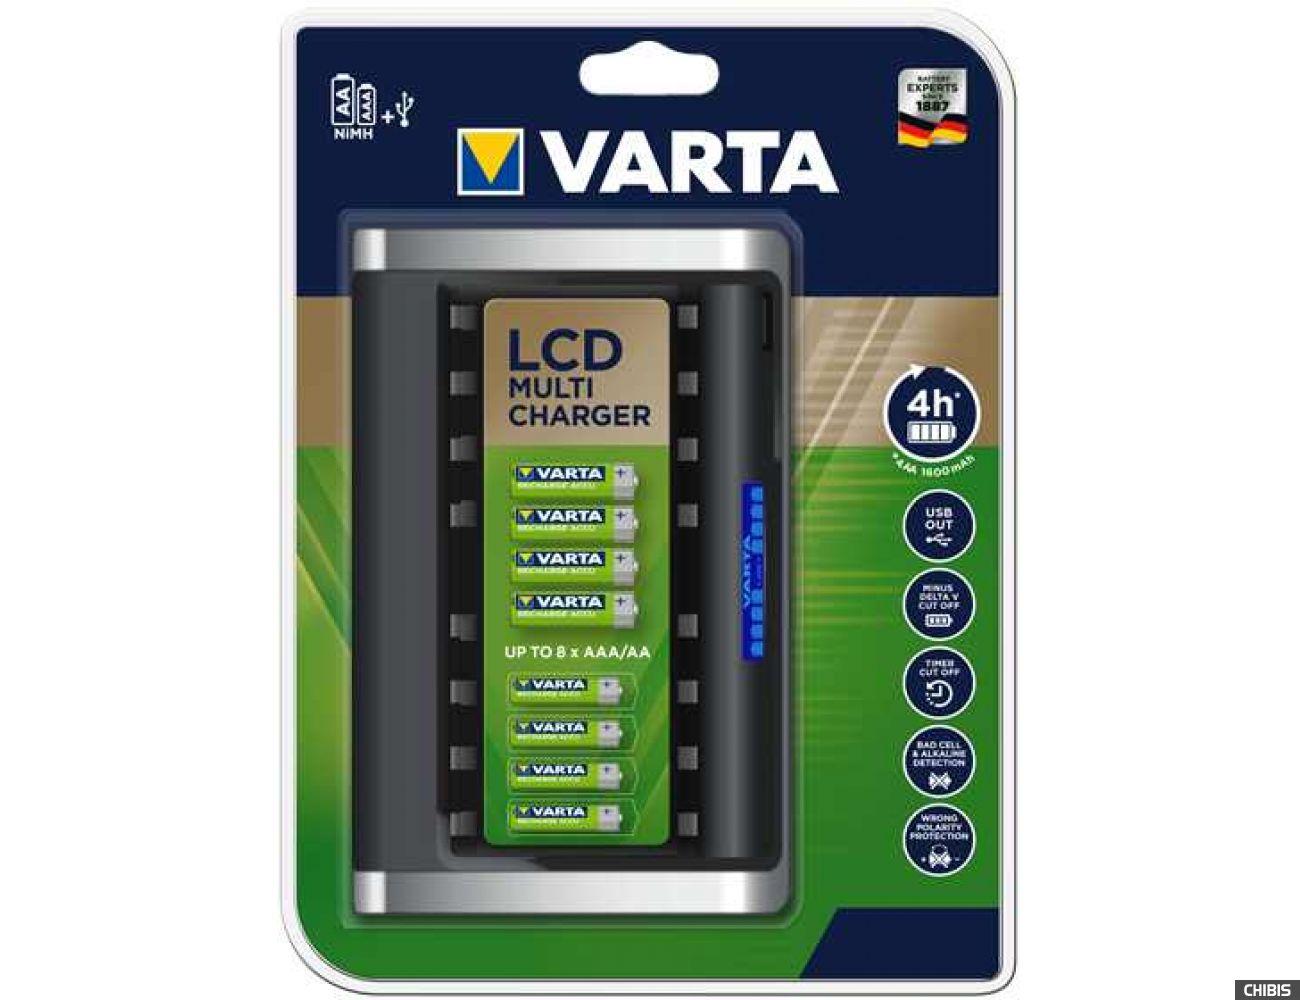 Зарядное устройство АА ААА Varta LCD Multi Charger в упаковке